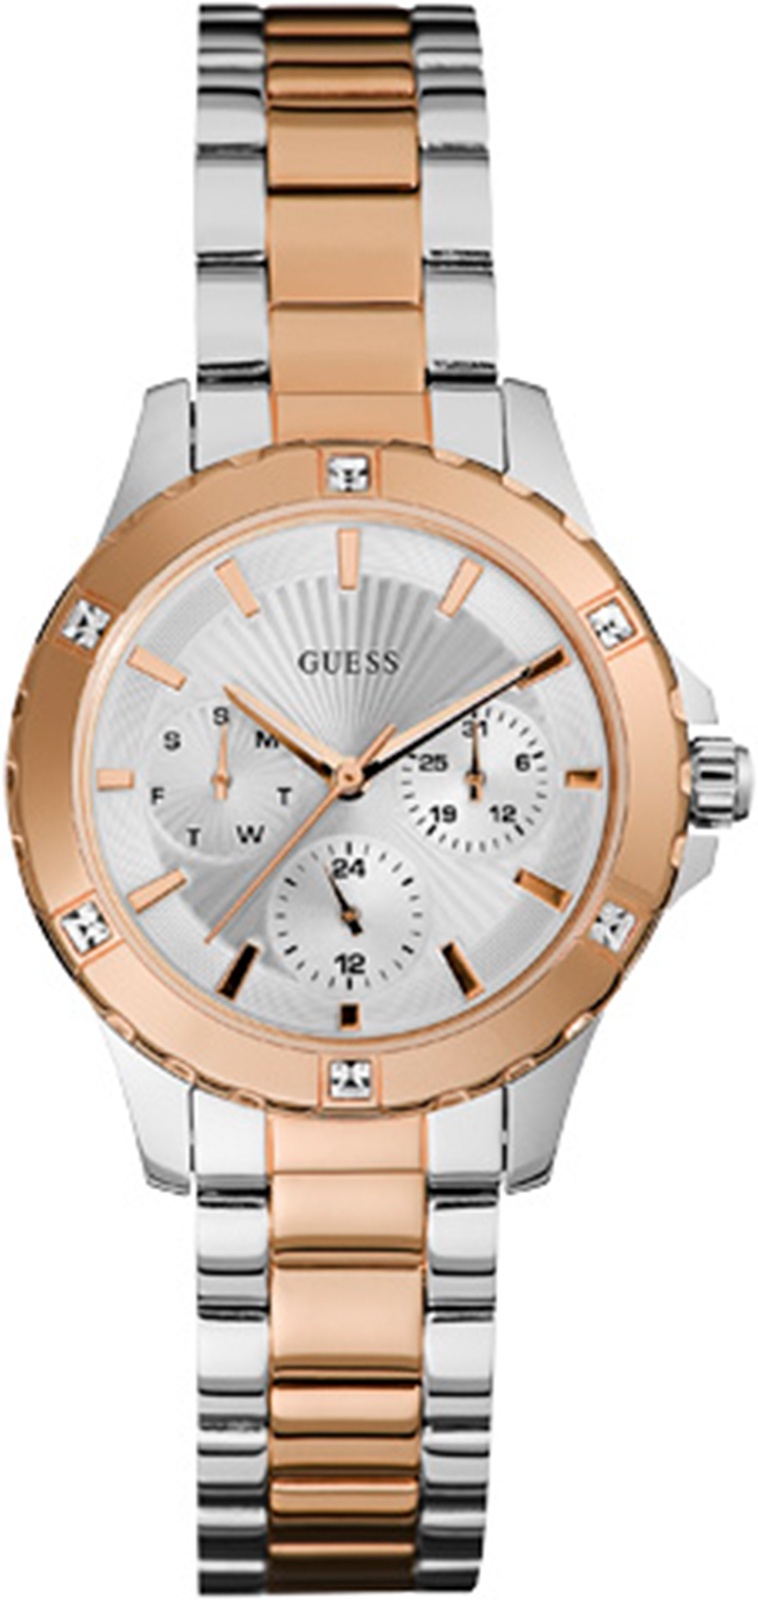 цена Часы Guess MIST онлайн в 2017 году